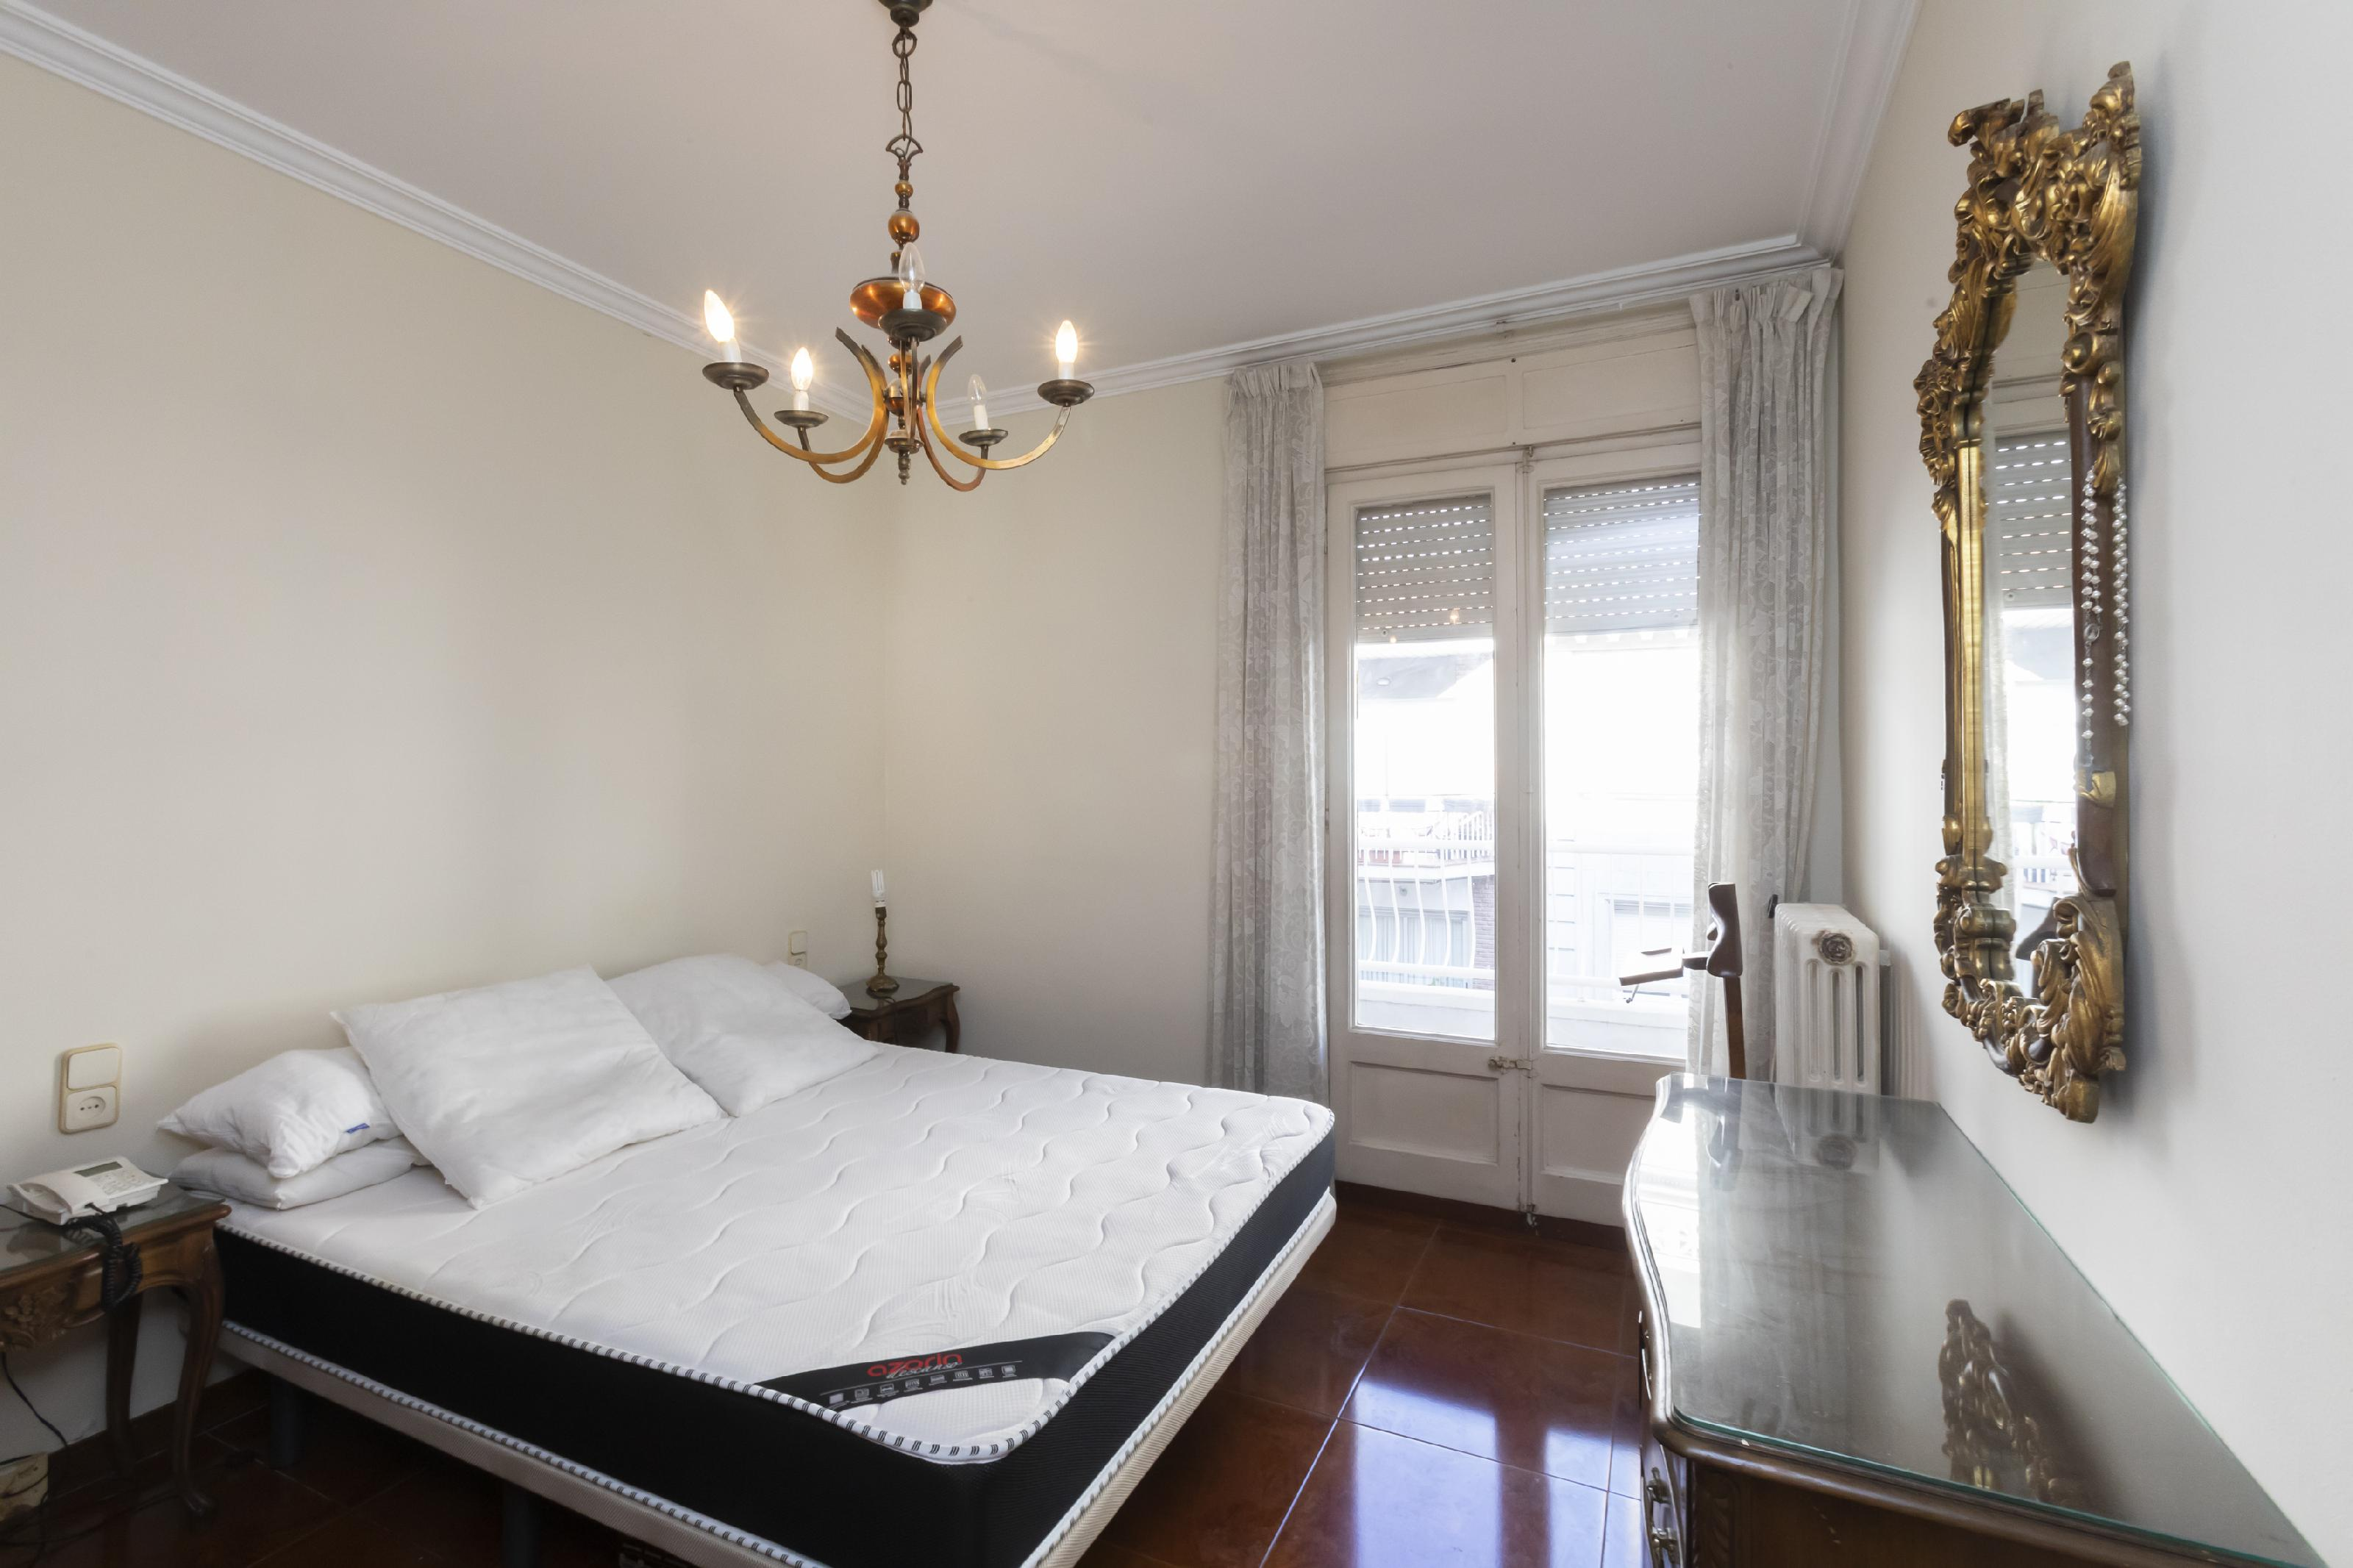 247097 Flat for sale in Sarrià-Sant Gervasi, Sant Gervasi-Galvany 19